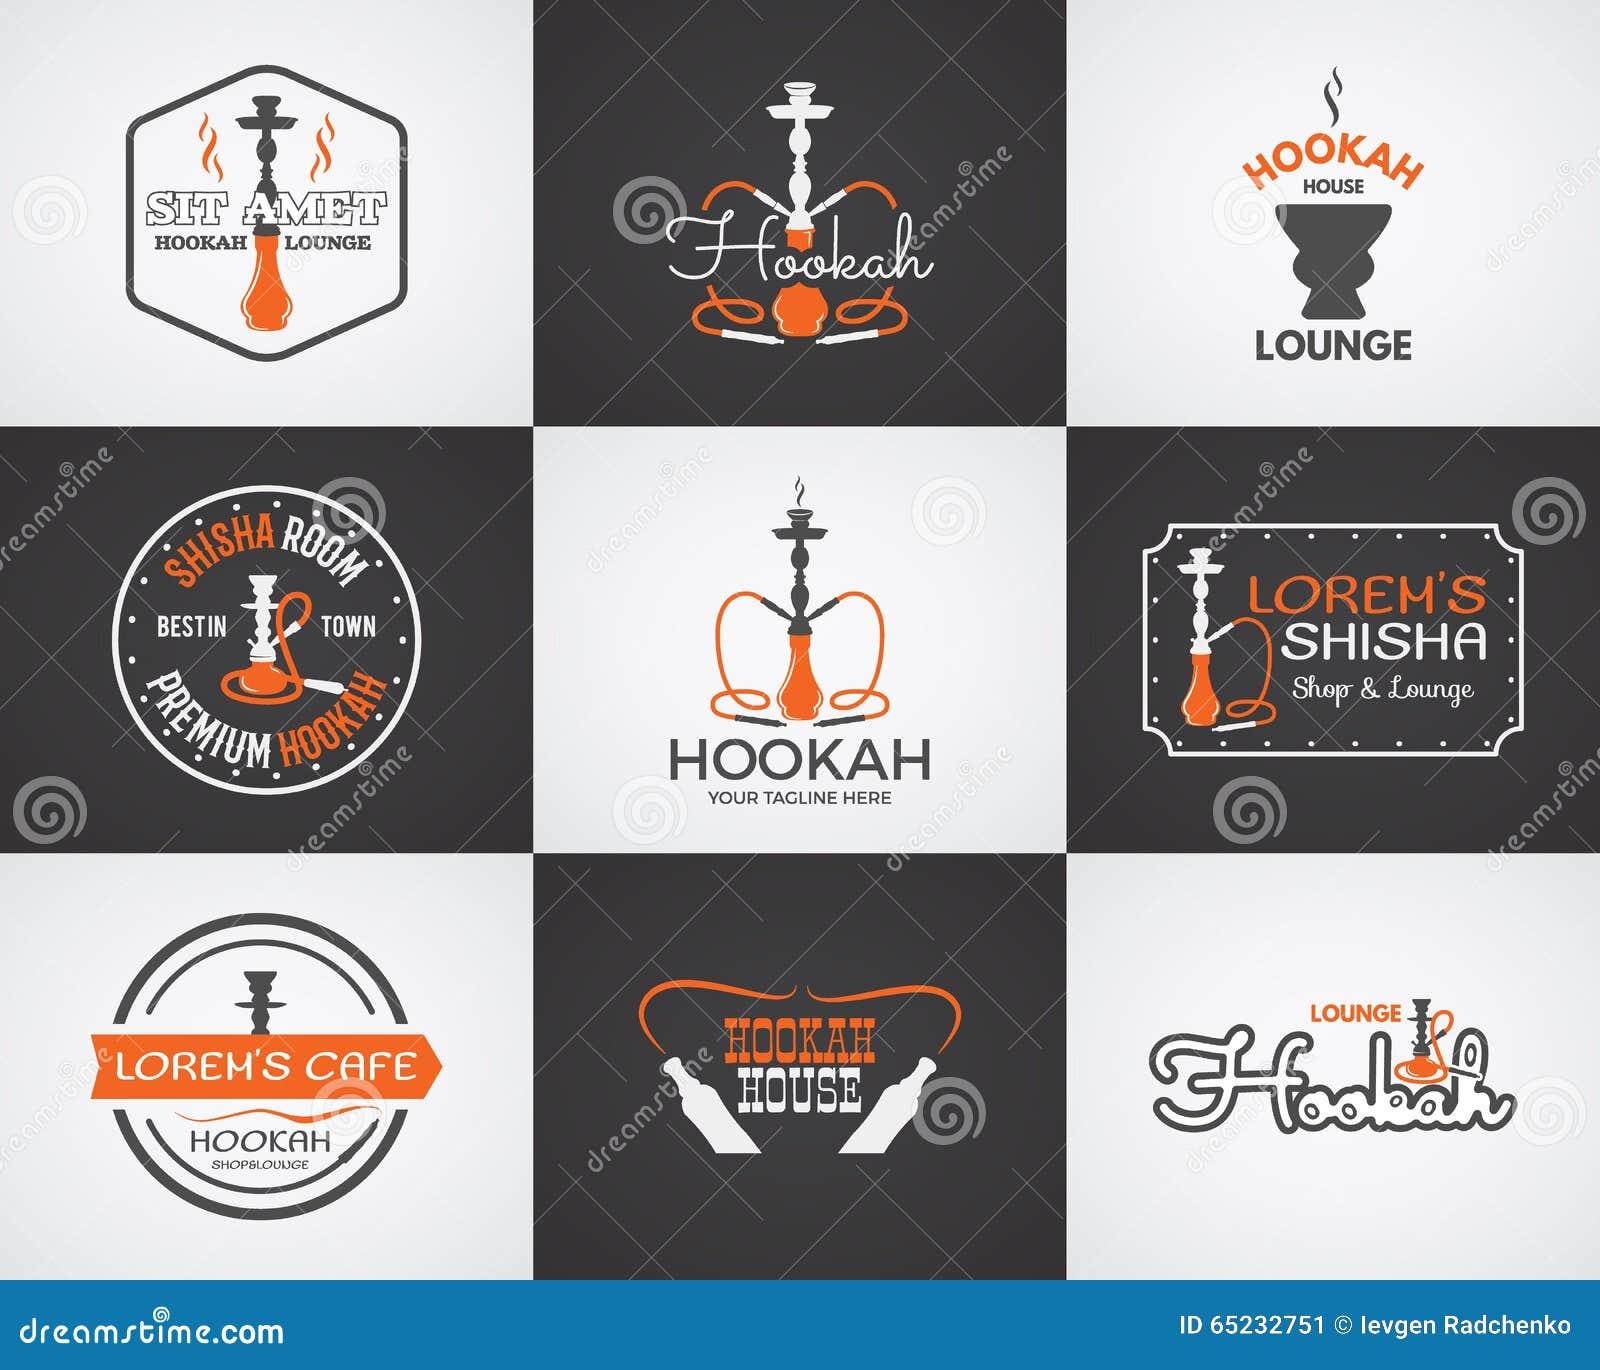 Hookah Vectors Photos and PSD files  Free Download